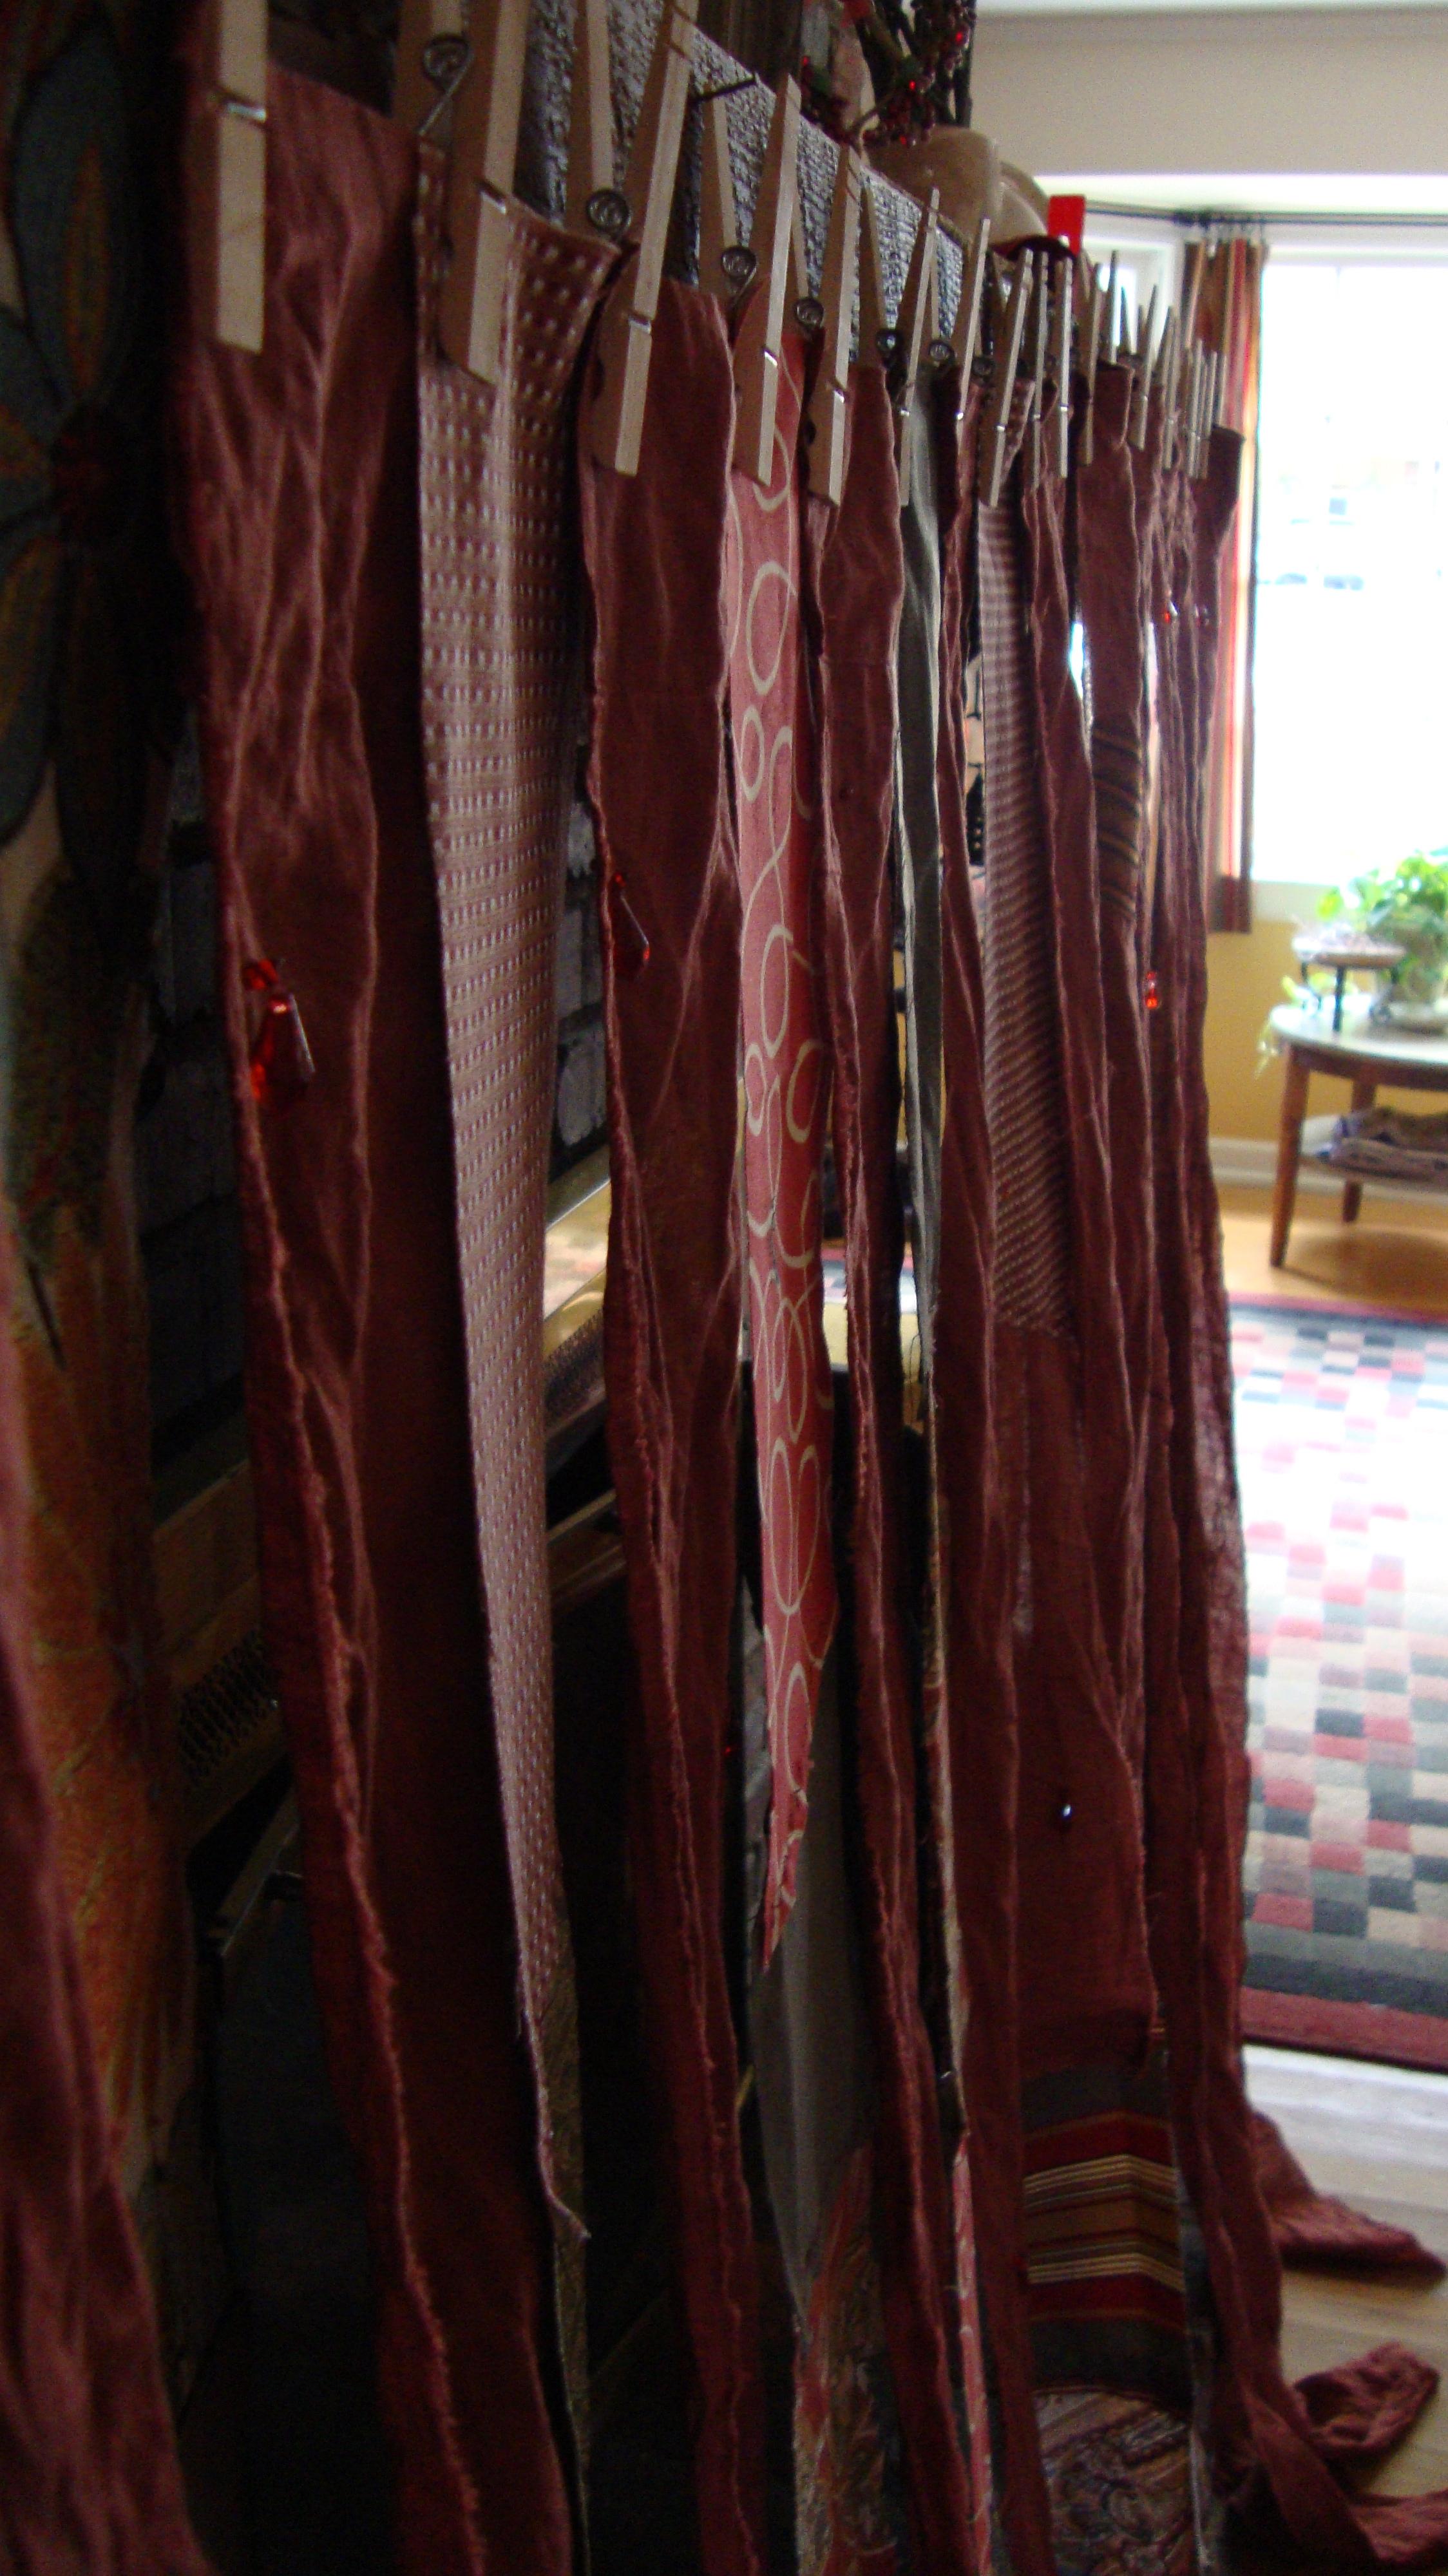 Fabric Strip Curtains - One